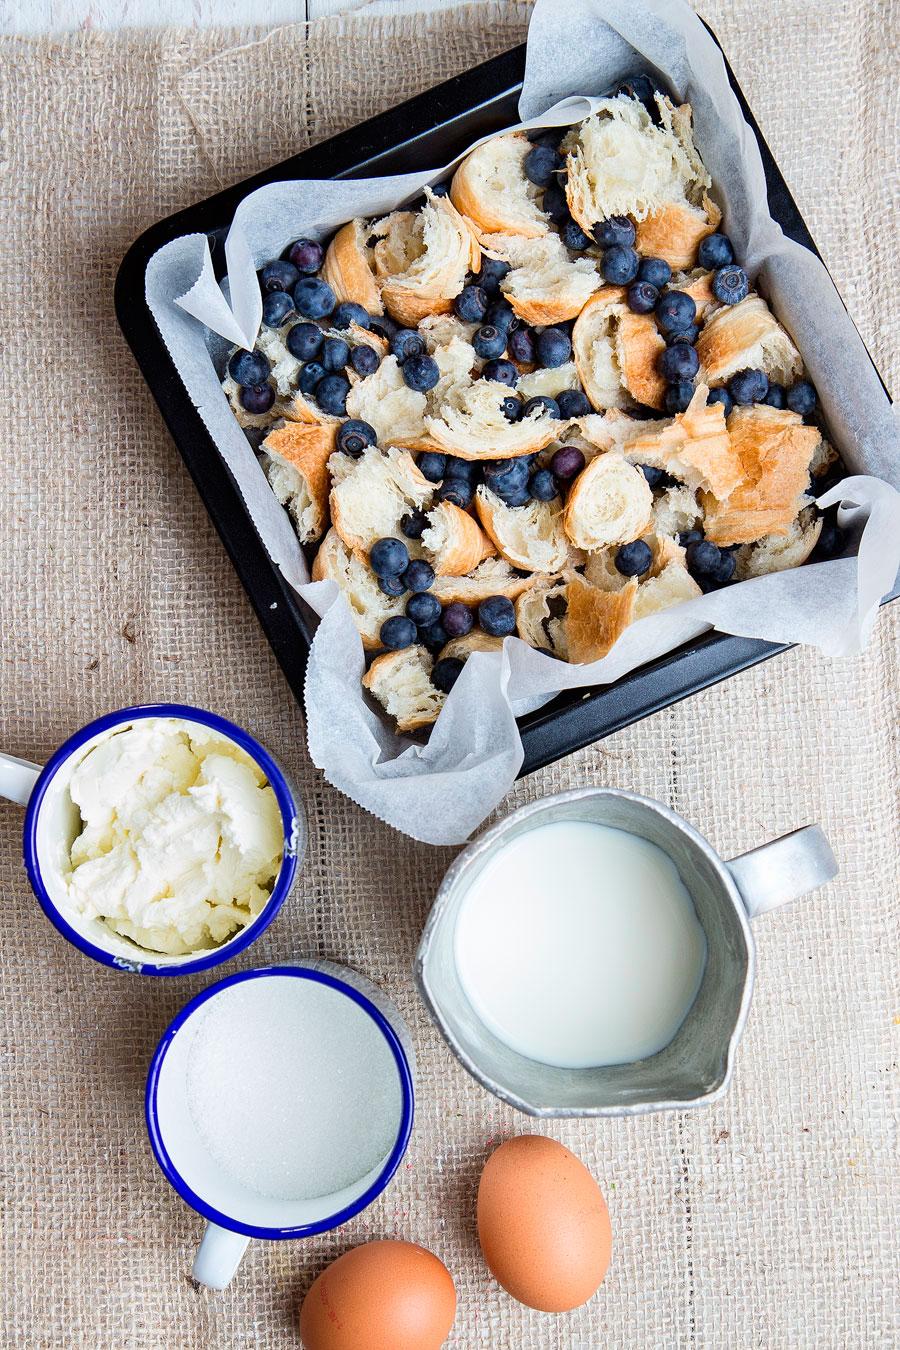 Blueberry cream cheese pudding